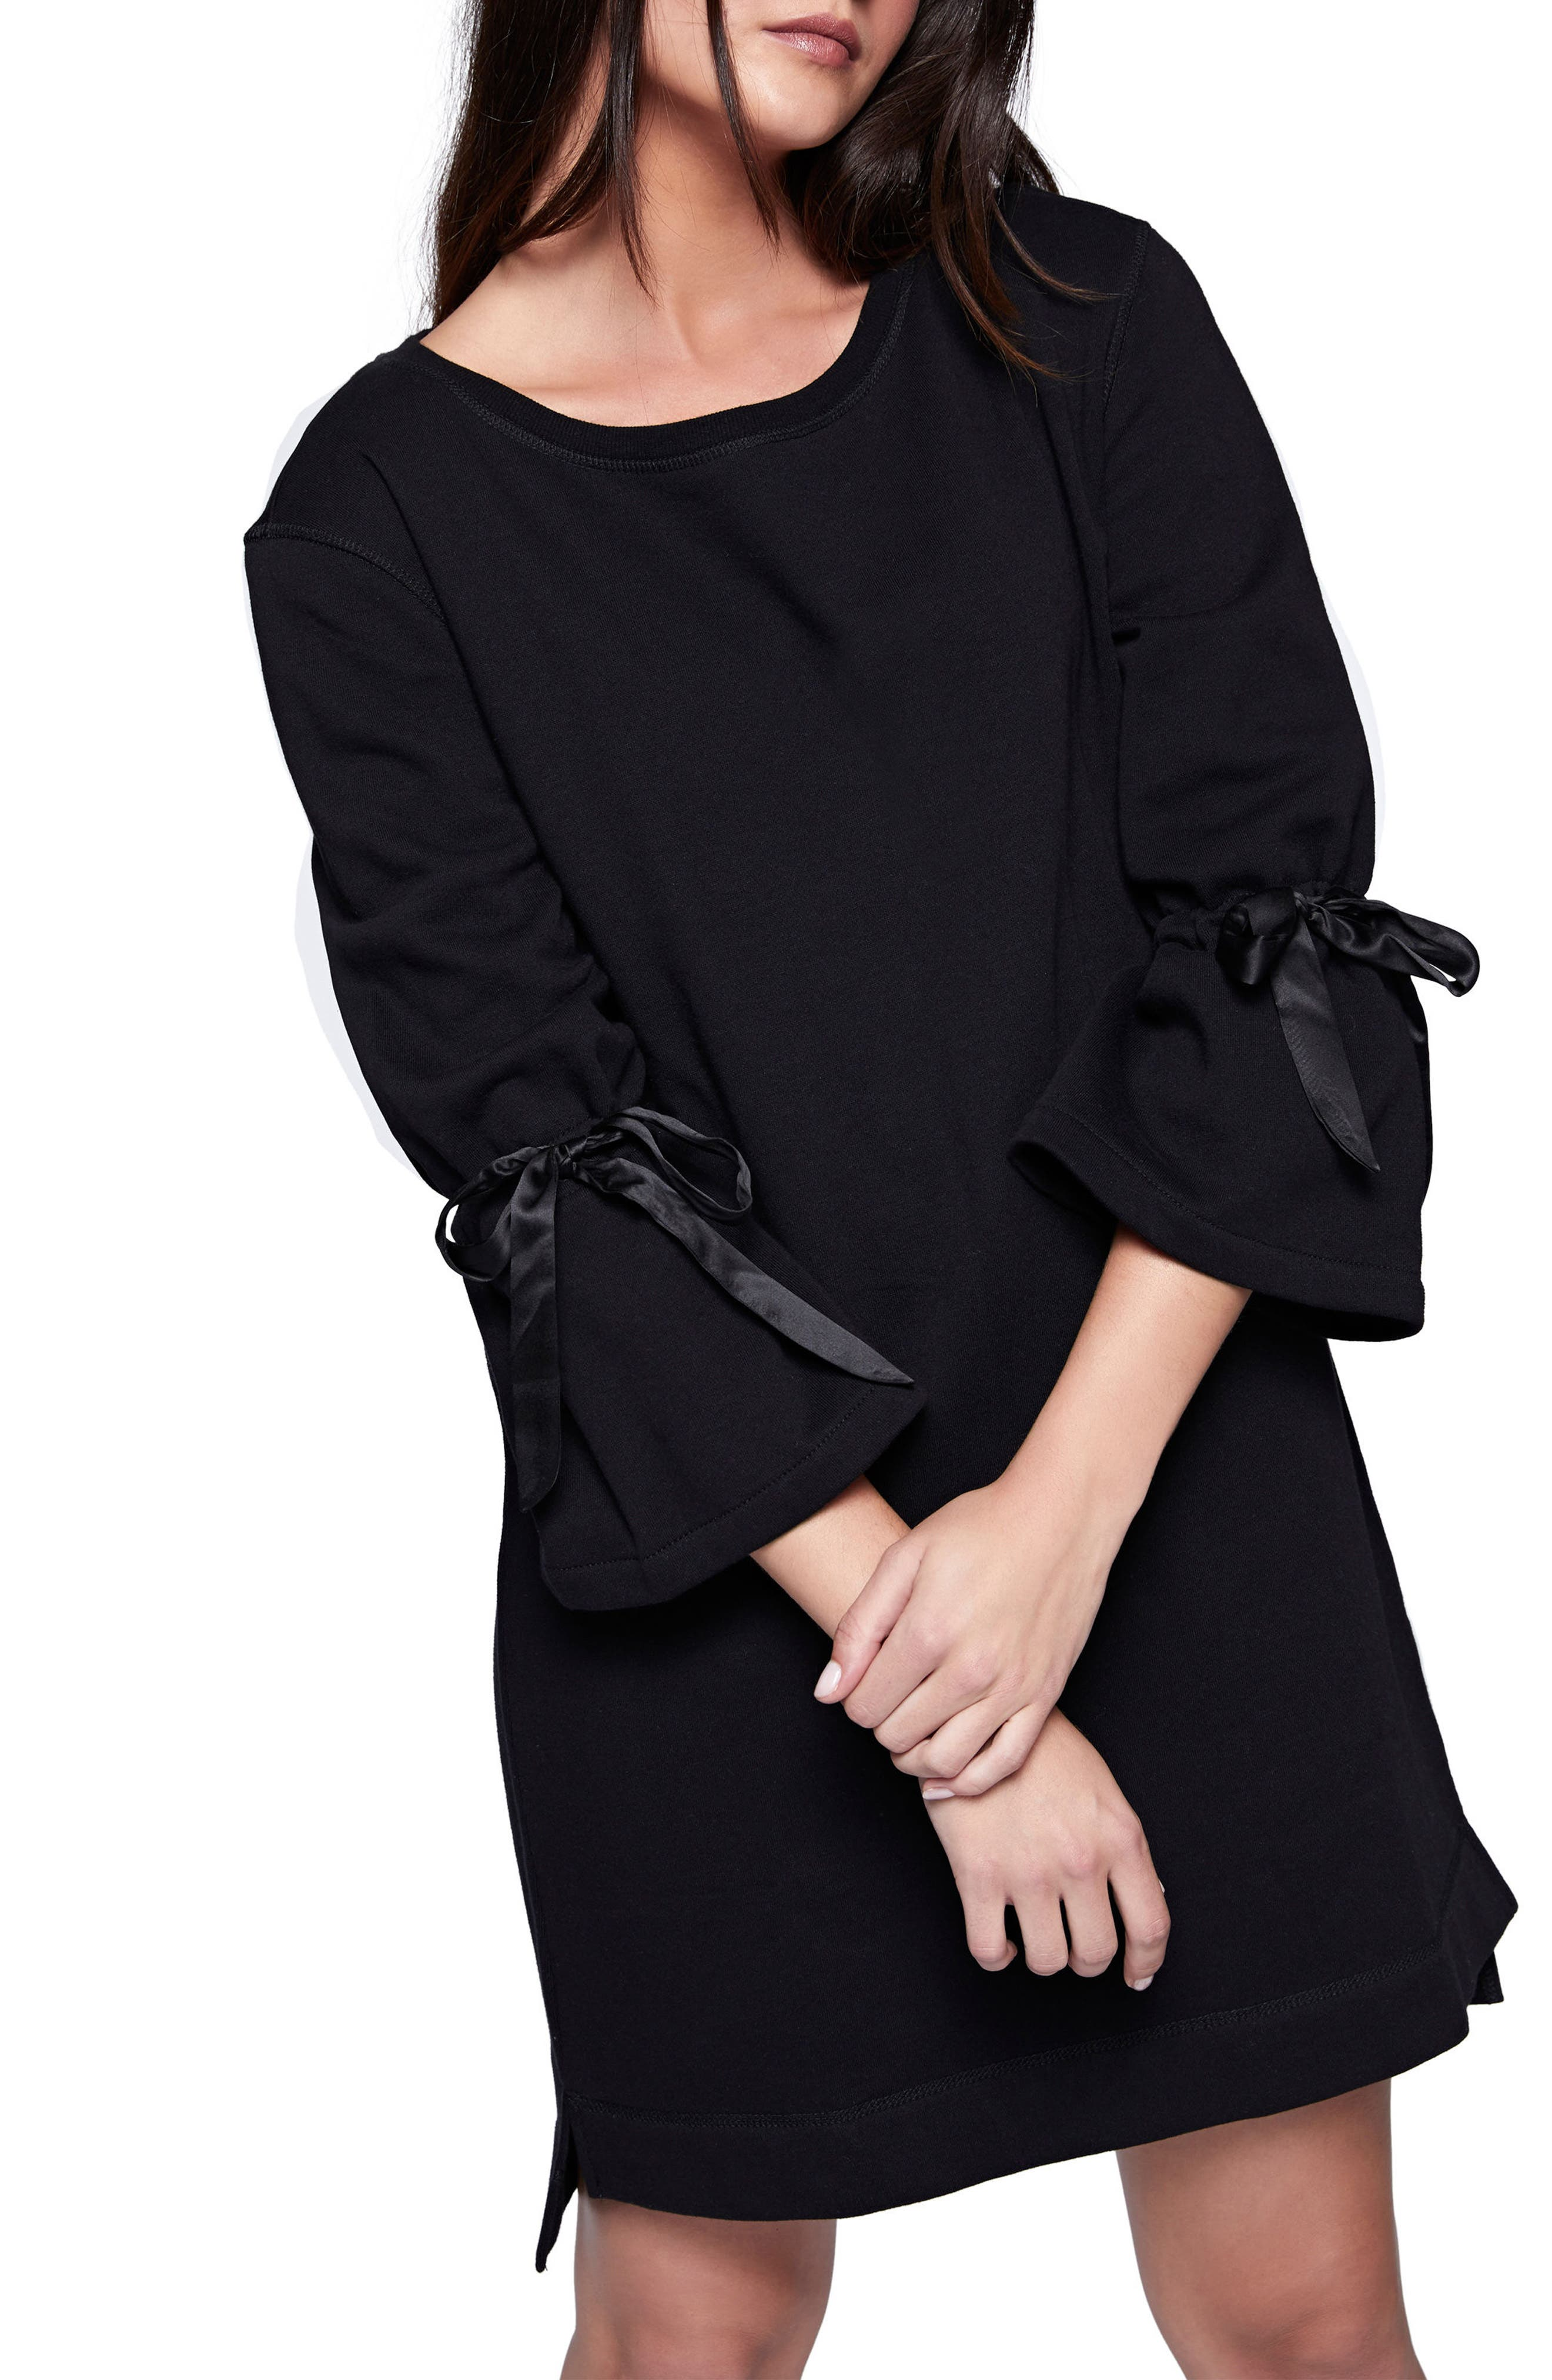 Alternate Image 1 Selected - Sanctuary Bell Sleeve Sweatshirt Dress